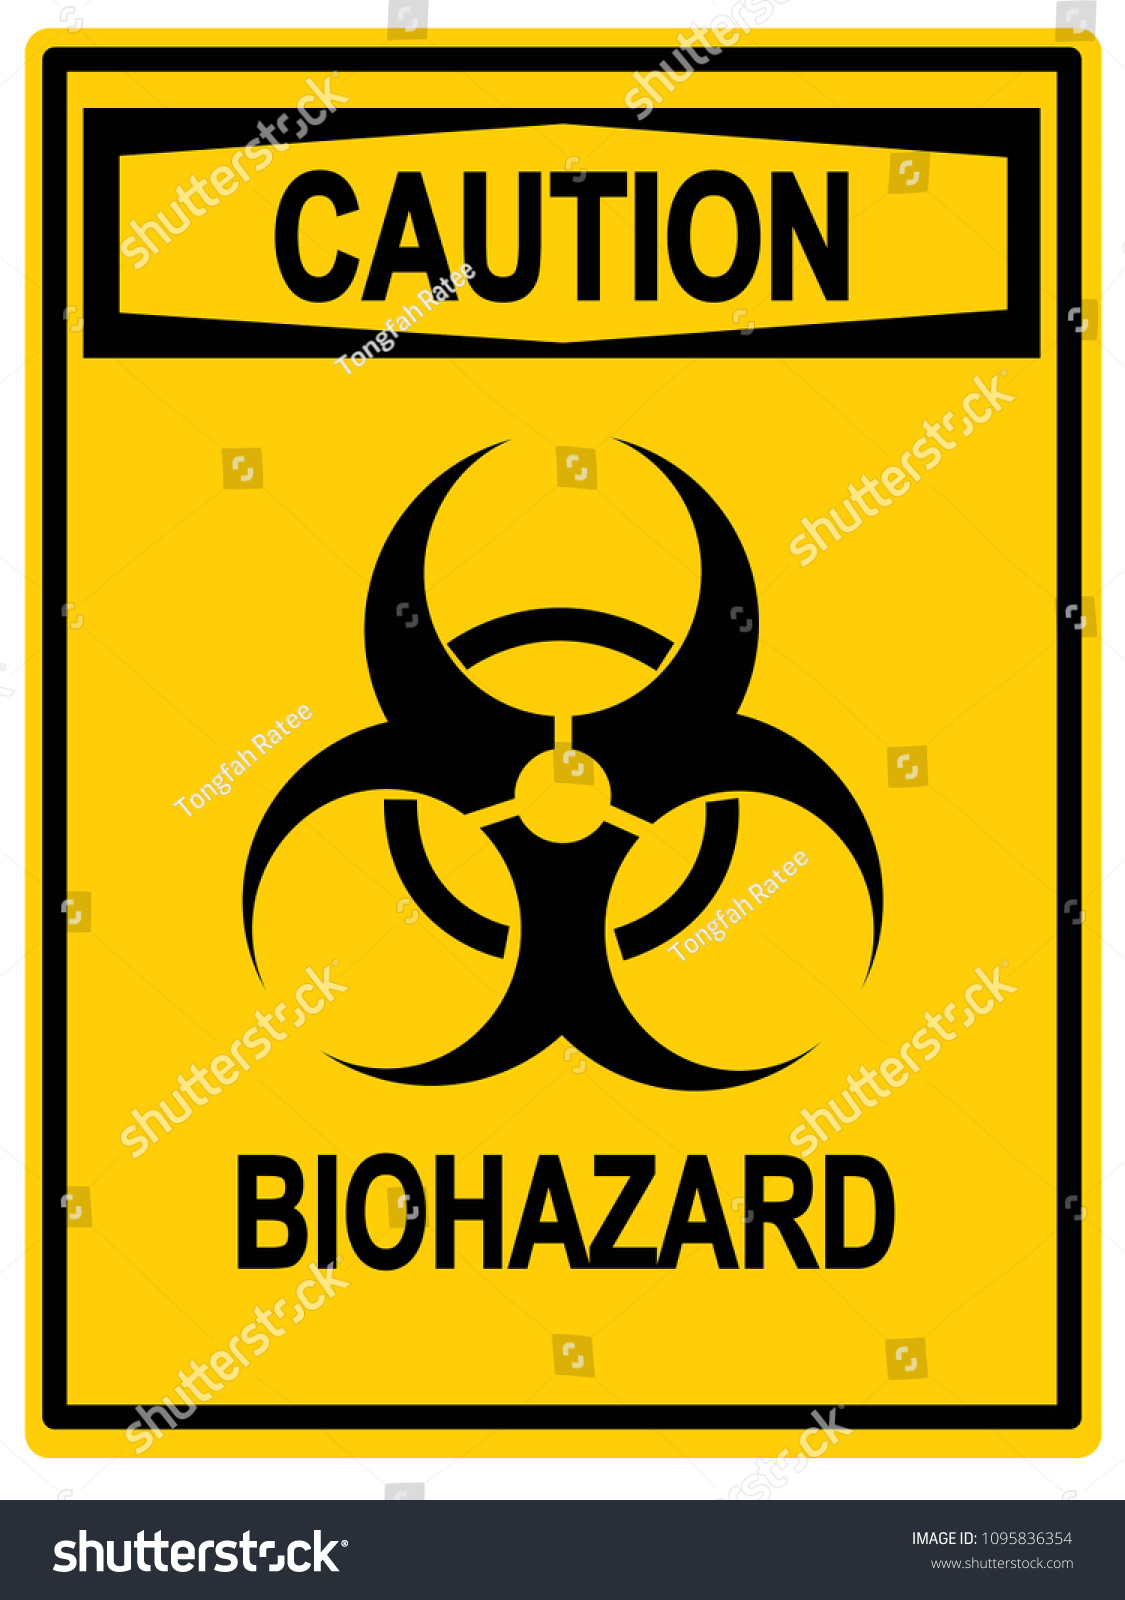 Biohazard Symbol Sign Caution Stock Illustration 1095836354